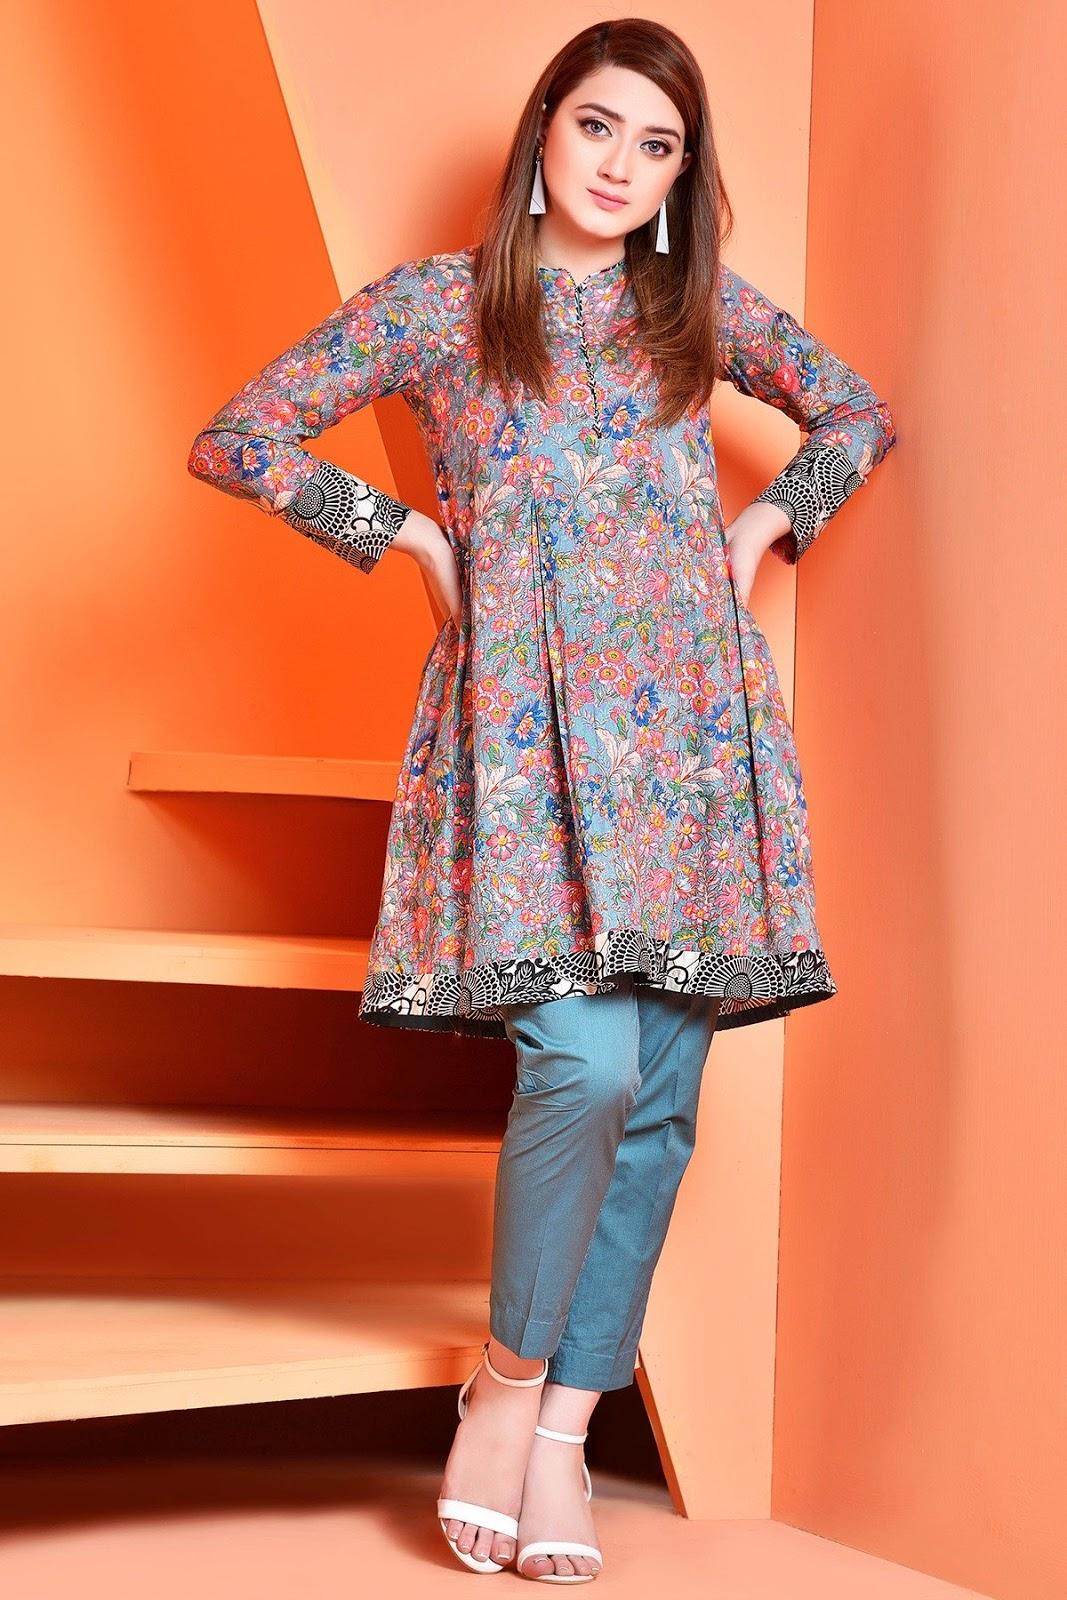 Momina Iqbal height & Weight